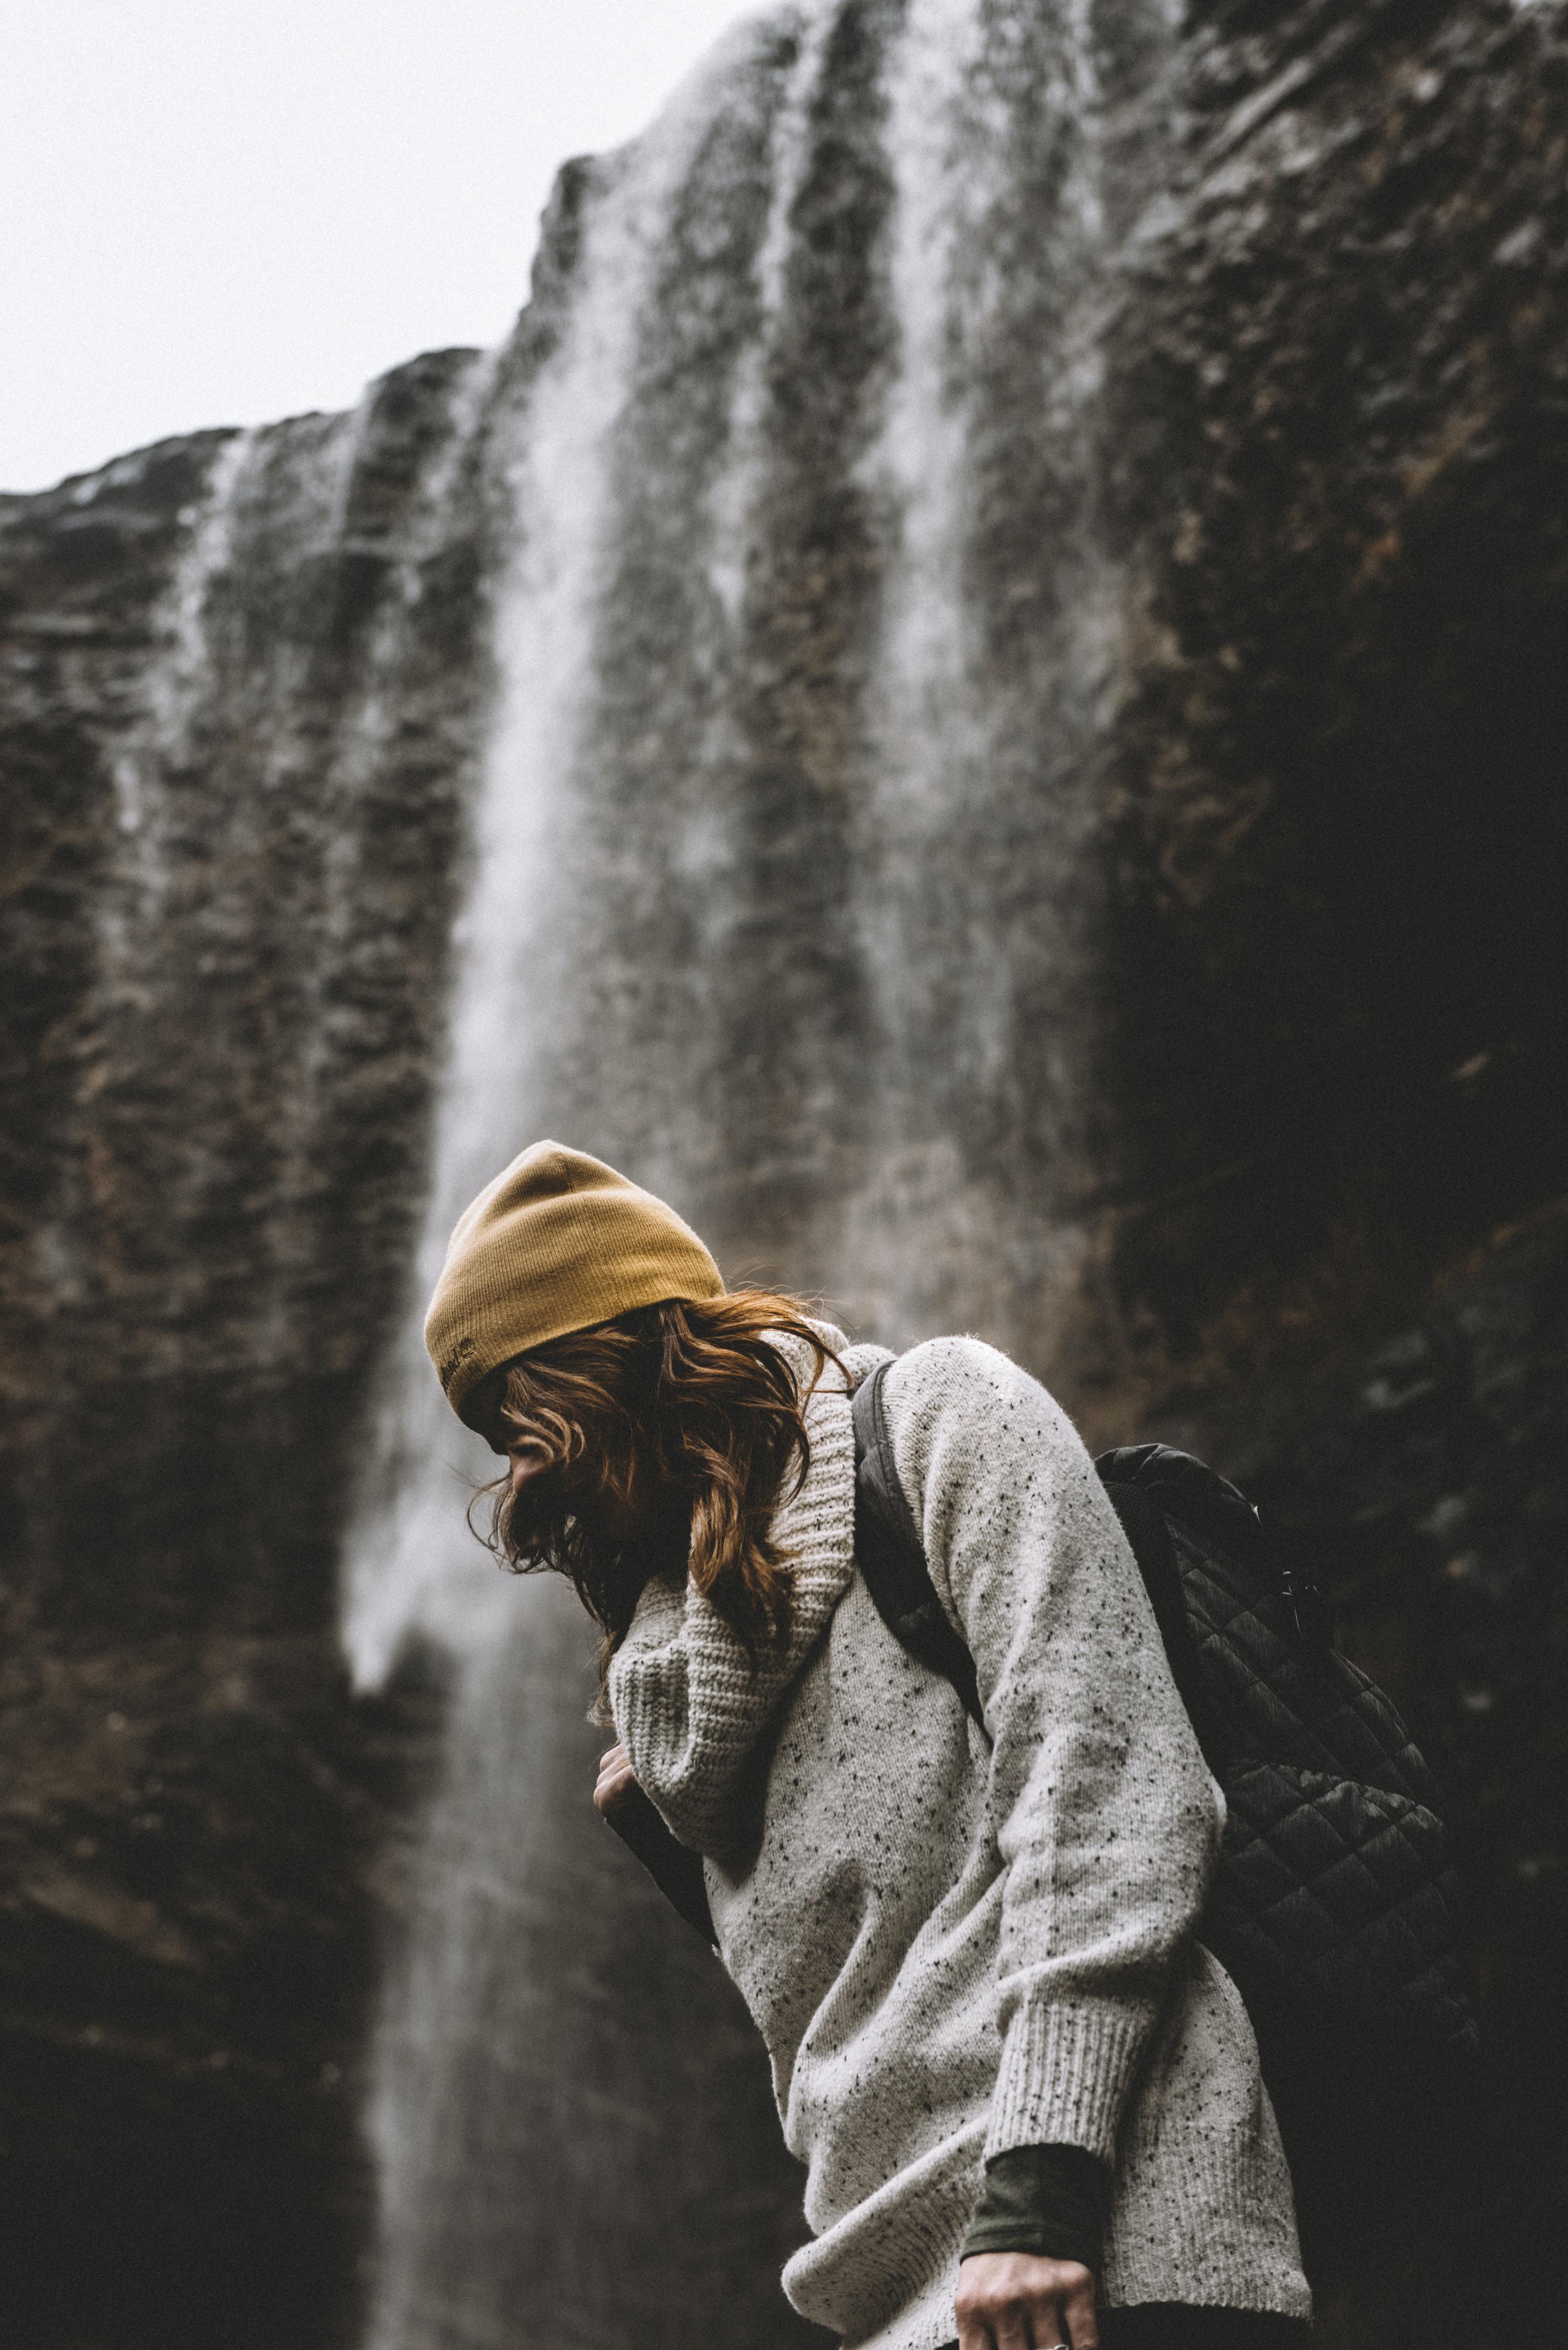 Hiker wearing a backpack walking past a waterfall